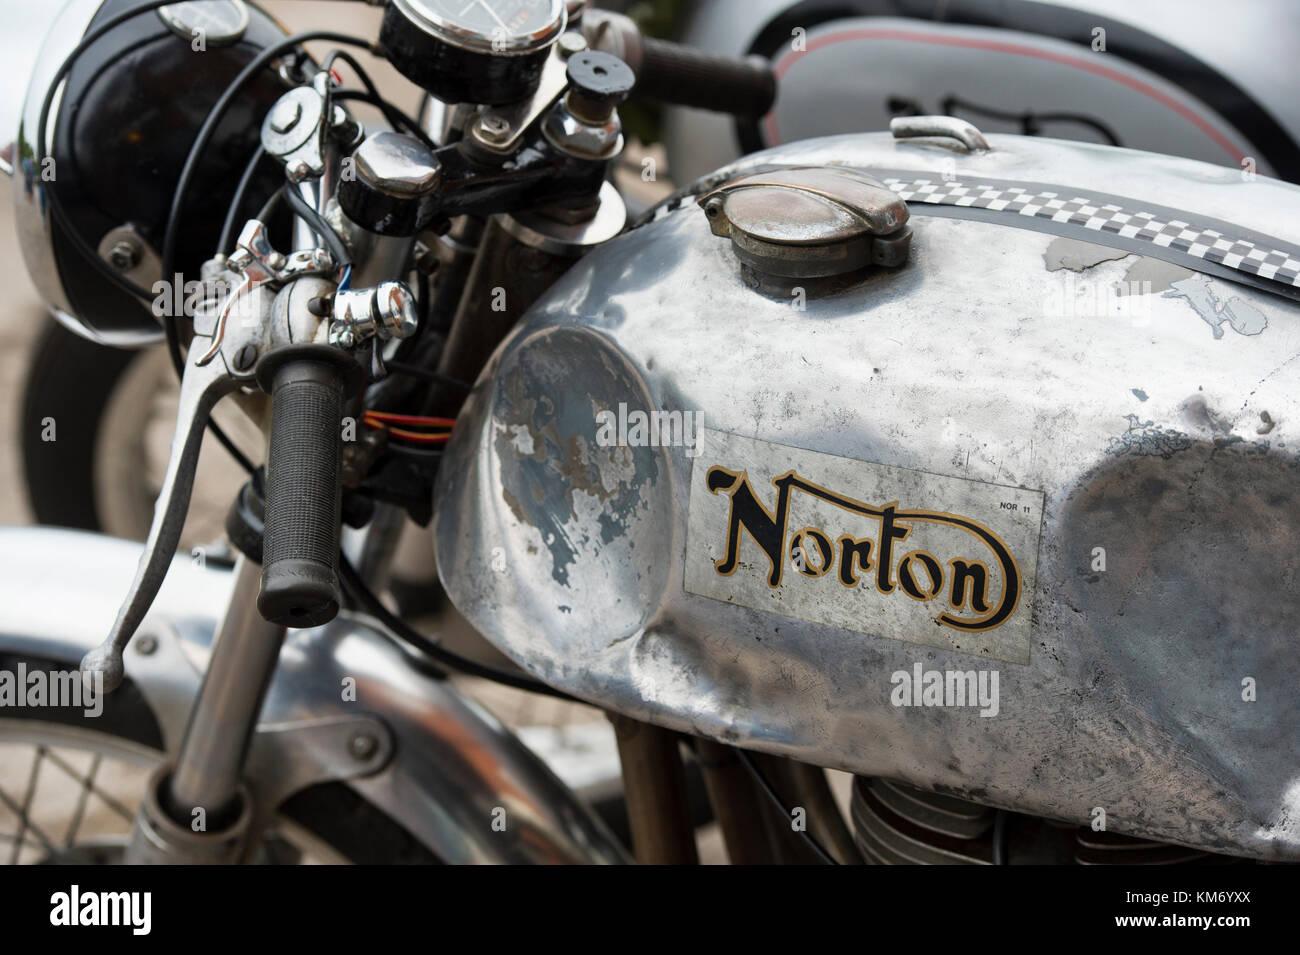 Old Norton Commando Cafe Racer Motorcycle Classic British Motorcycle Stock Photo Alamy